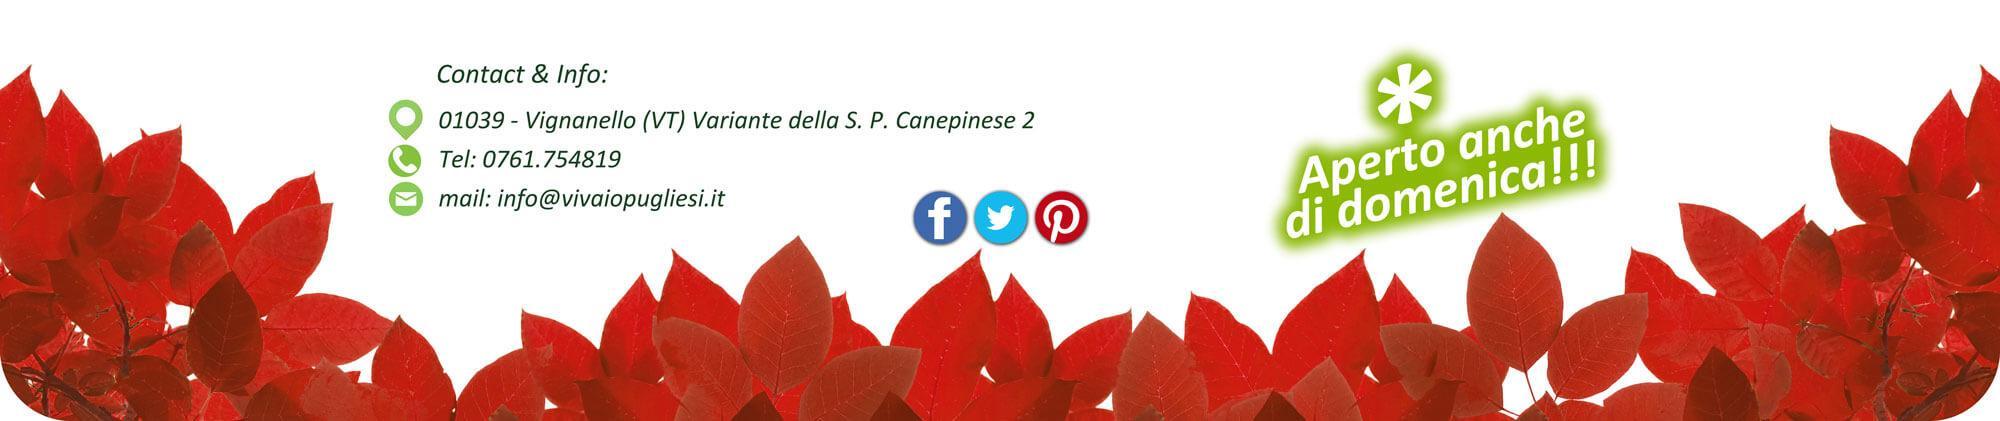 www.vivaiopugliesi.it